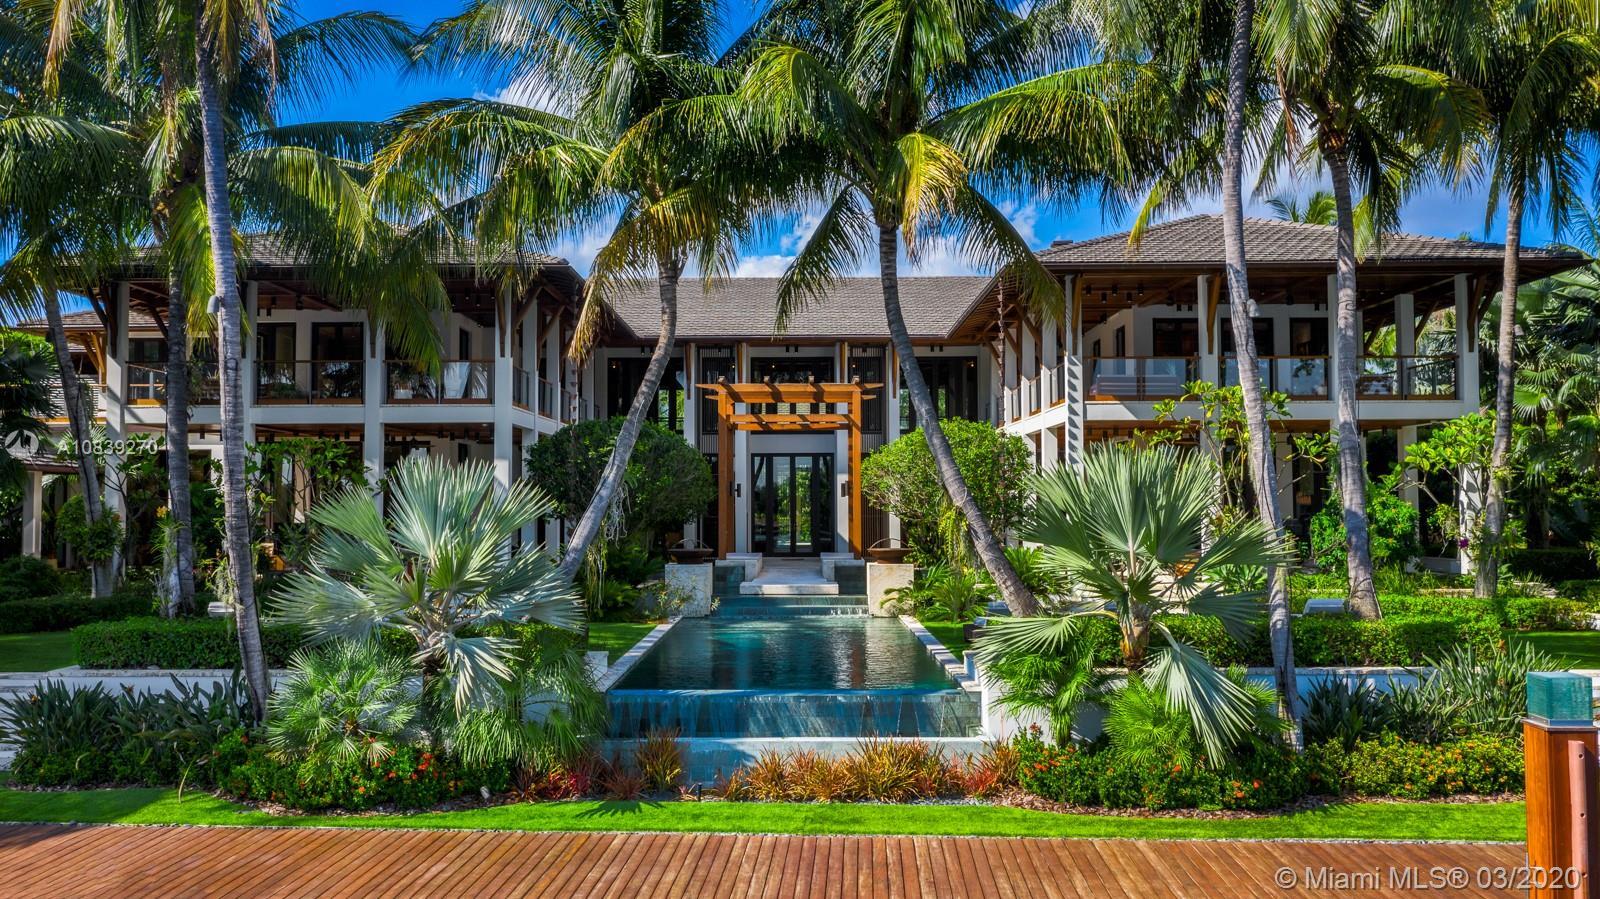 620 Arvida Pkwy, Coral Gables, Florida 33156, 9 Bedrooms Bedrooms, ,16 BathroomsBathrooms,Residential,For Sale,620 Arvida Pkwy,A10839270